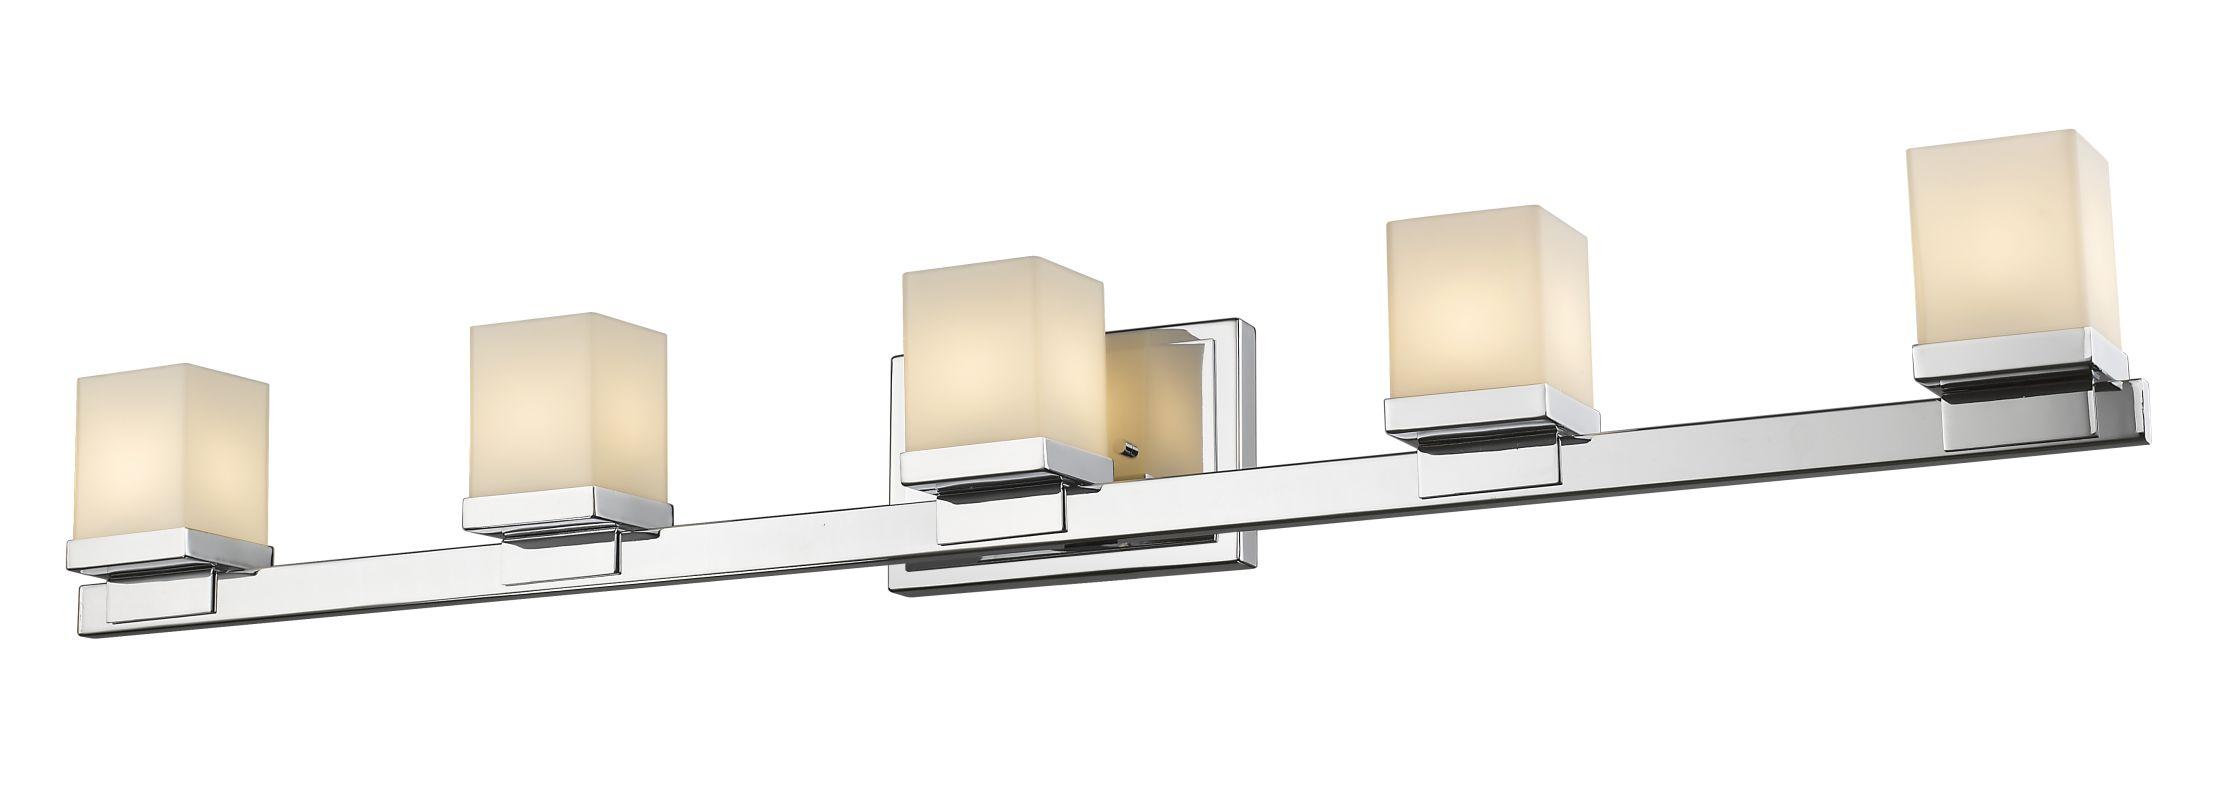 Z-Lite 1913-5V Cadiz 5 Light Bathroom Vanity Fixture Chrome Indoor Sale $378.00 ITEM: bci2613941 ID#:1913-5V-CH UPC: 685659039351 :